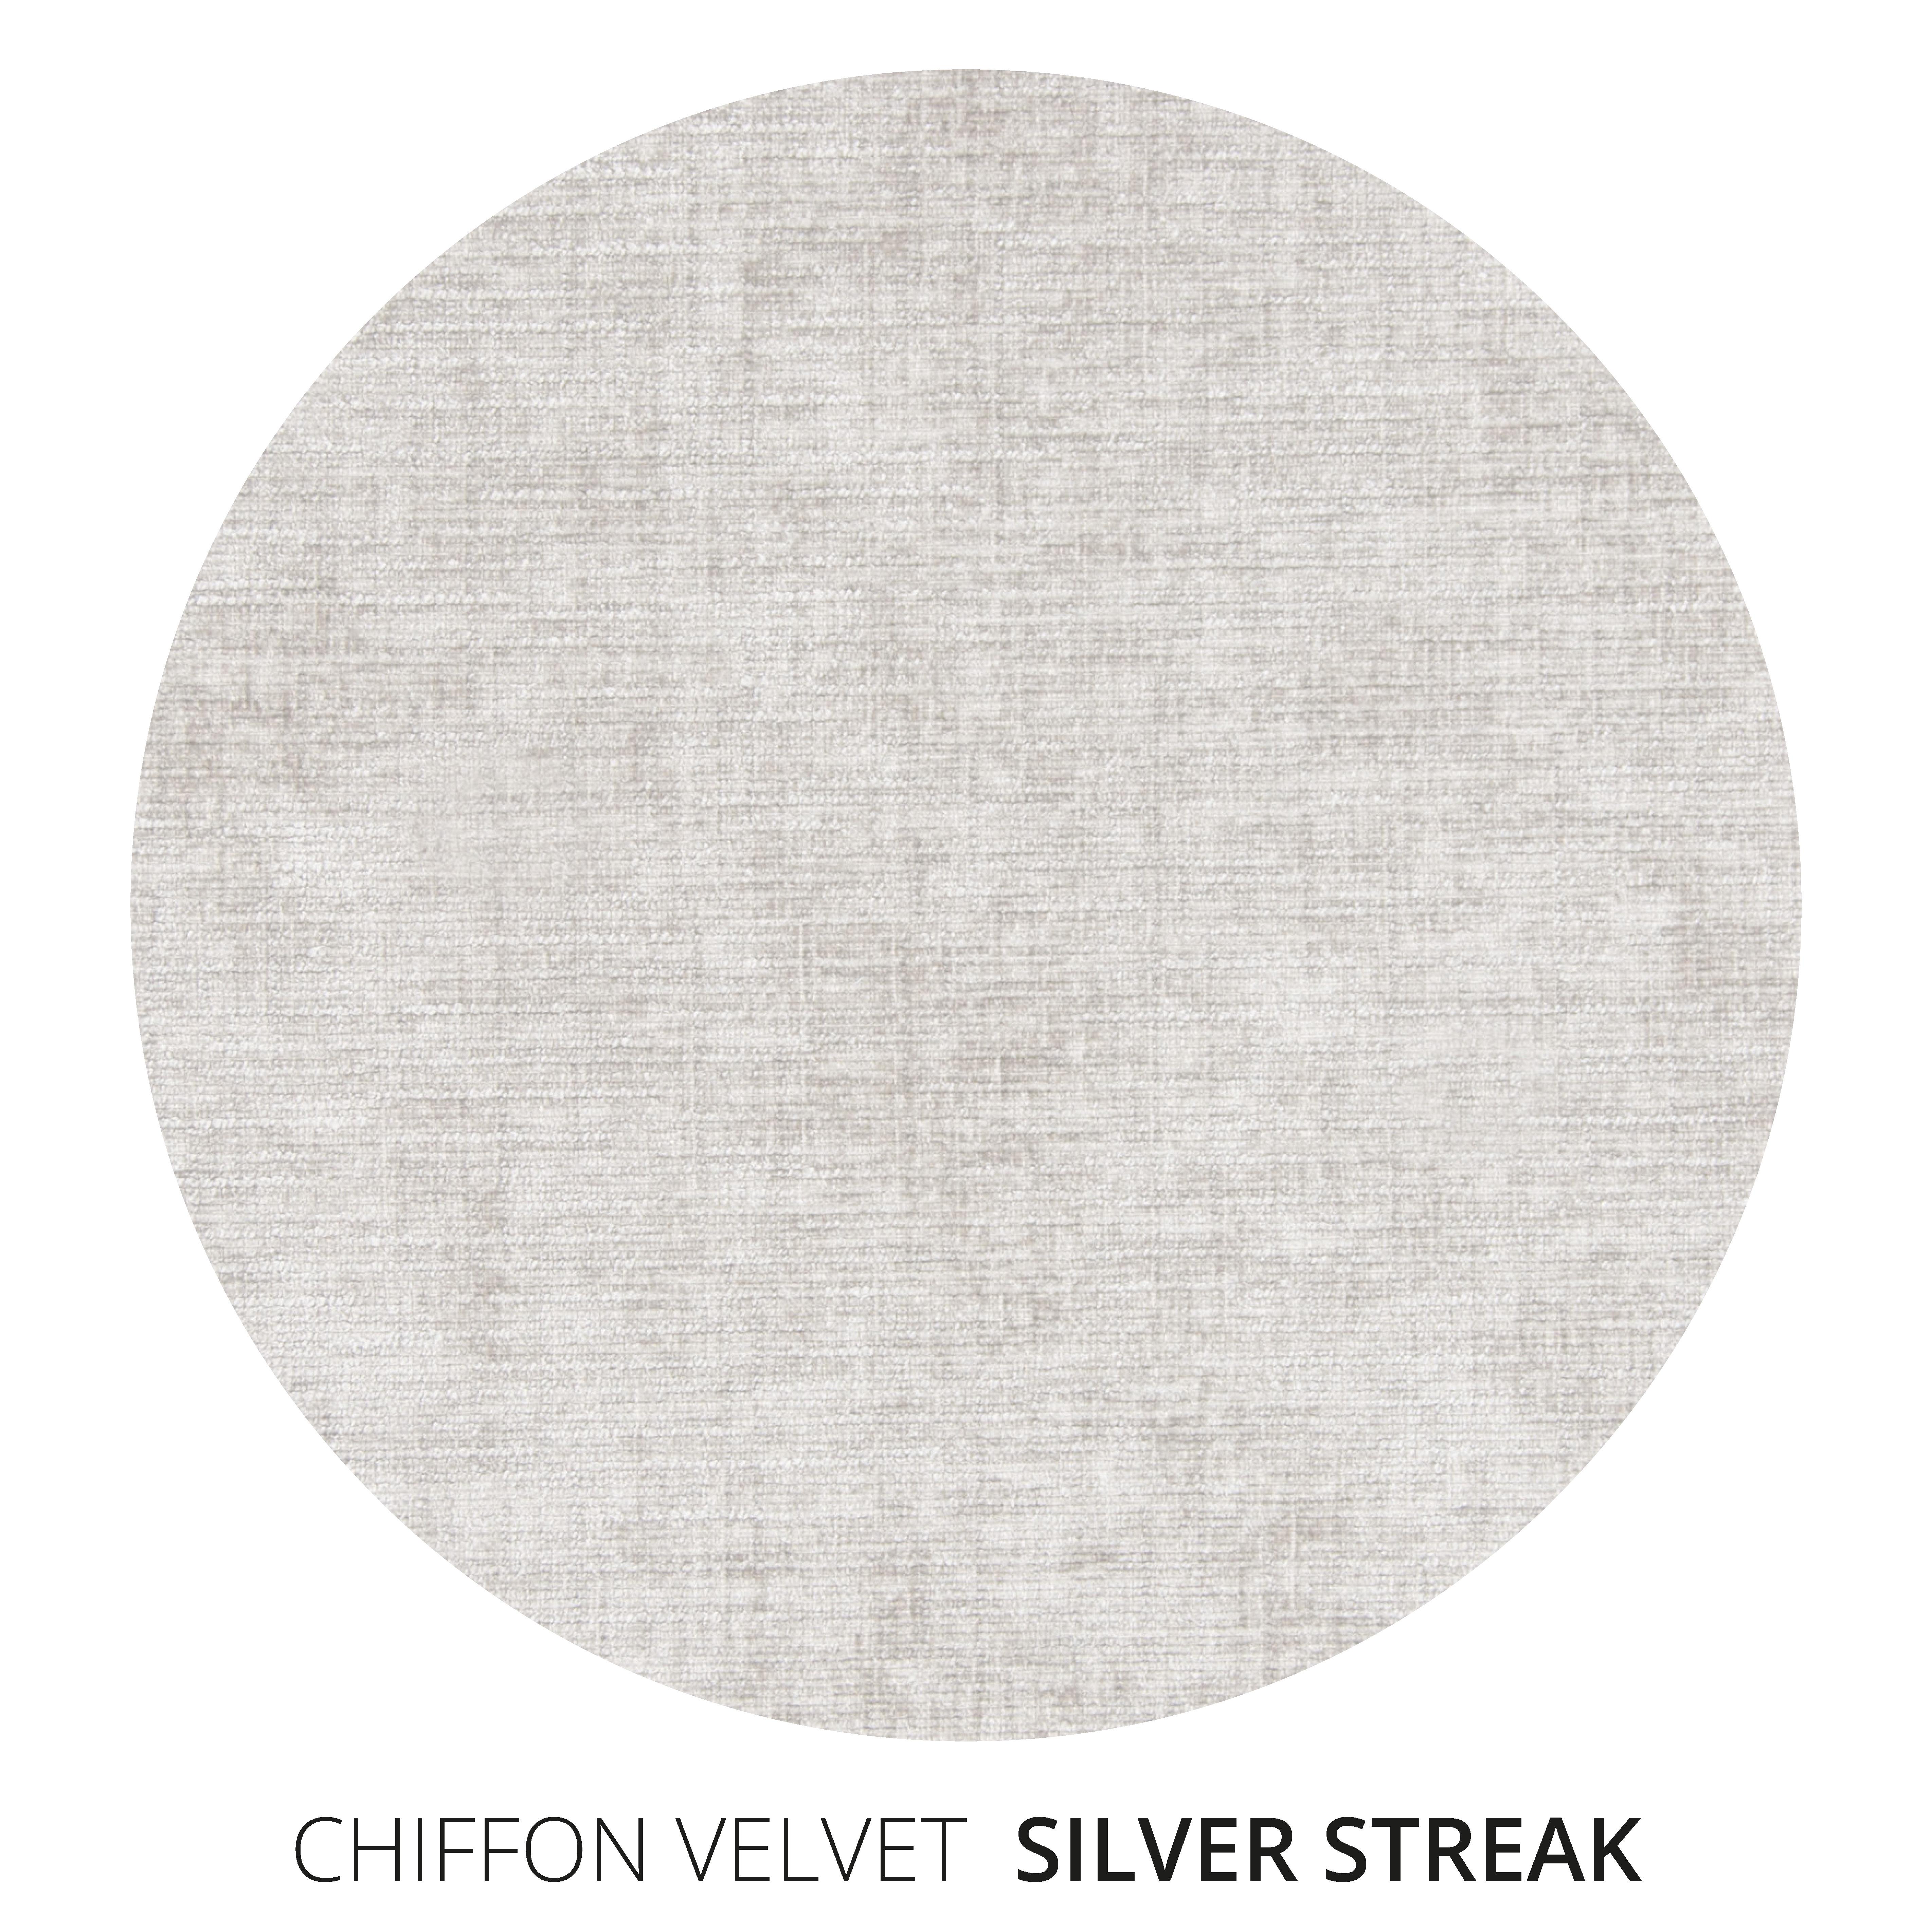 Silver Streak Chiffon Velvet Swatch